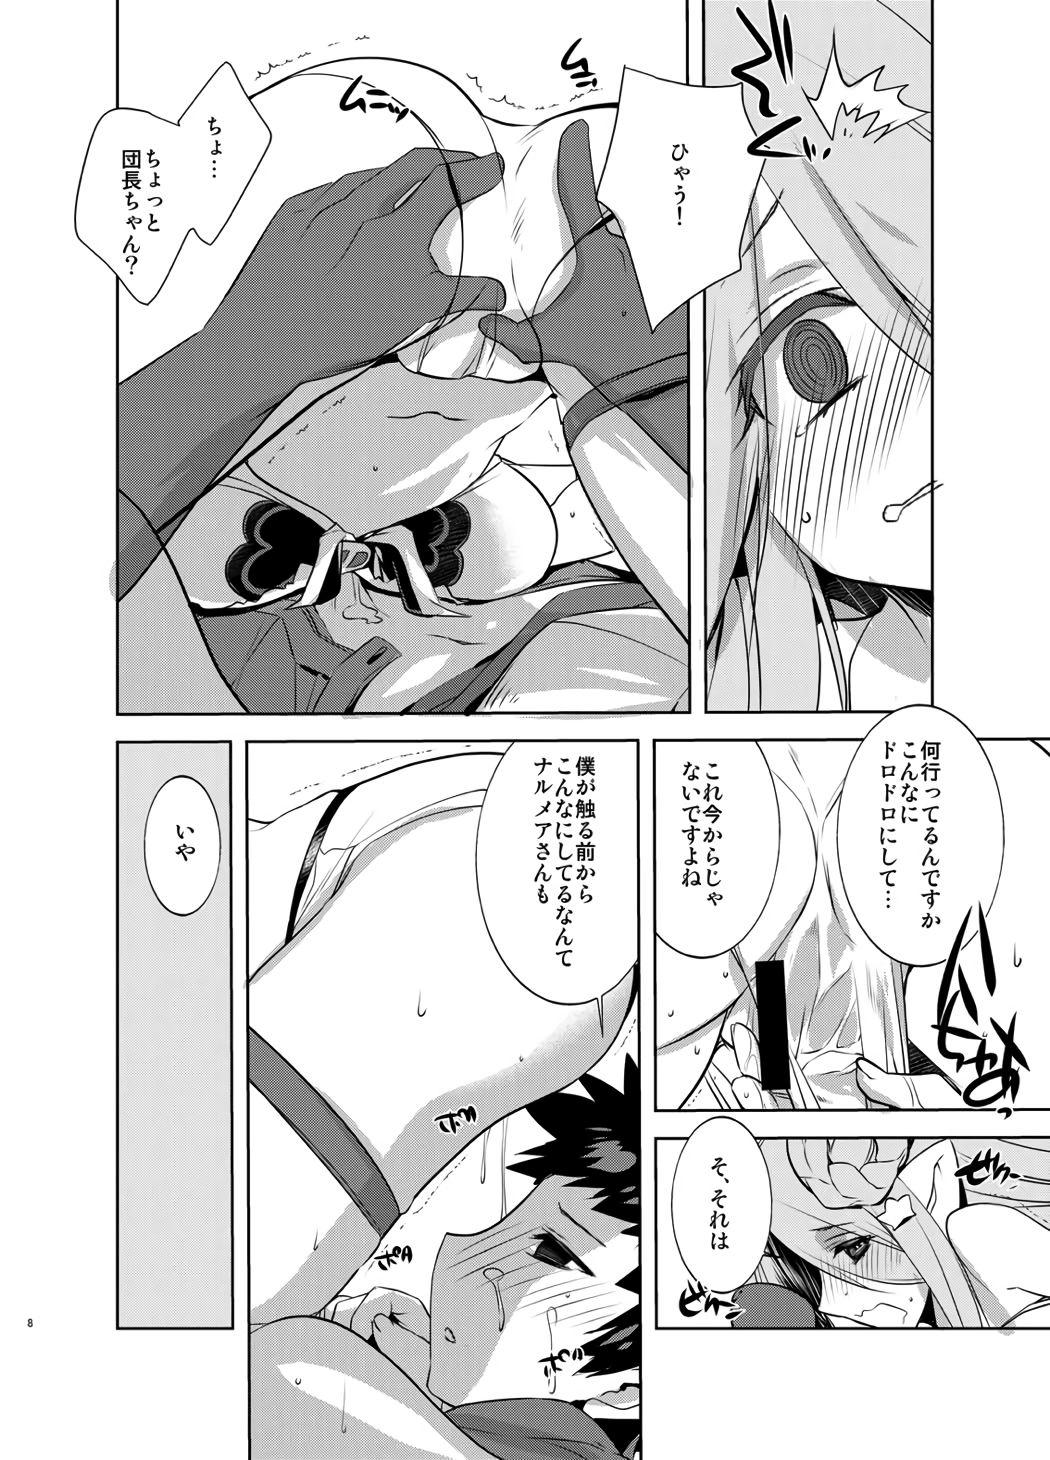 Onee-chan ga Mizugi ni Kigaetara 6